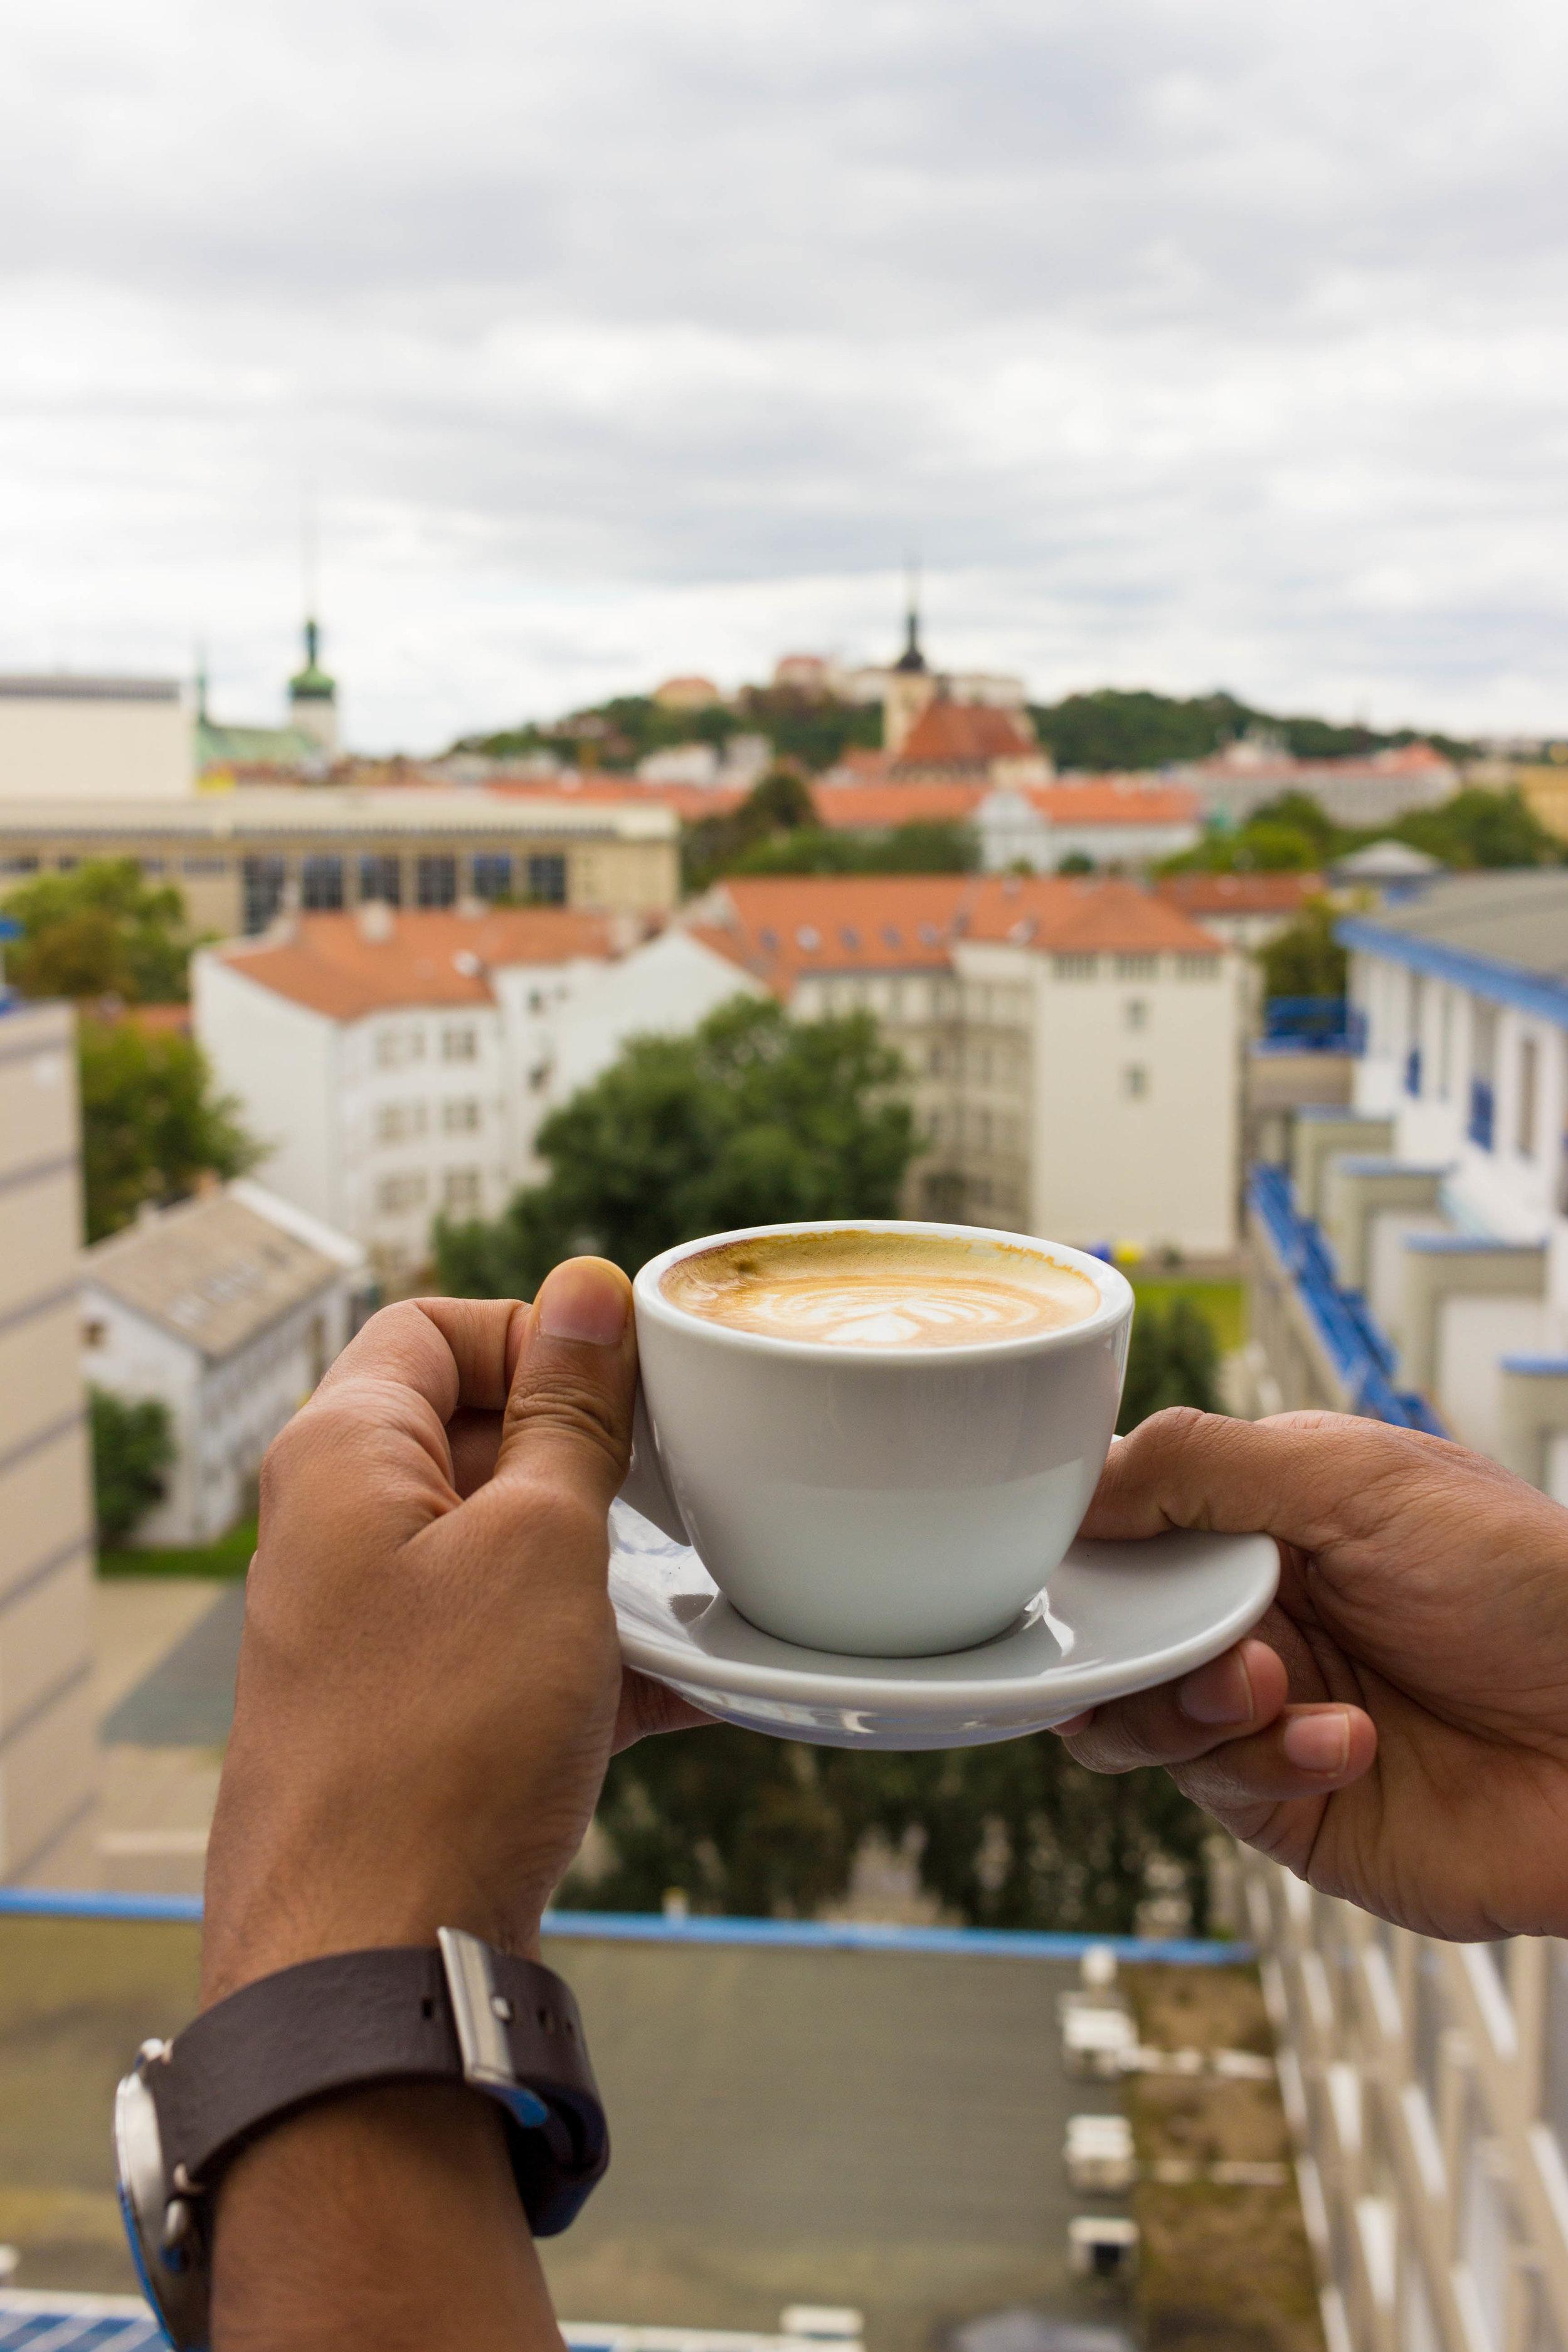 Coffee in Brno